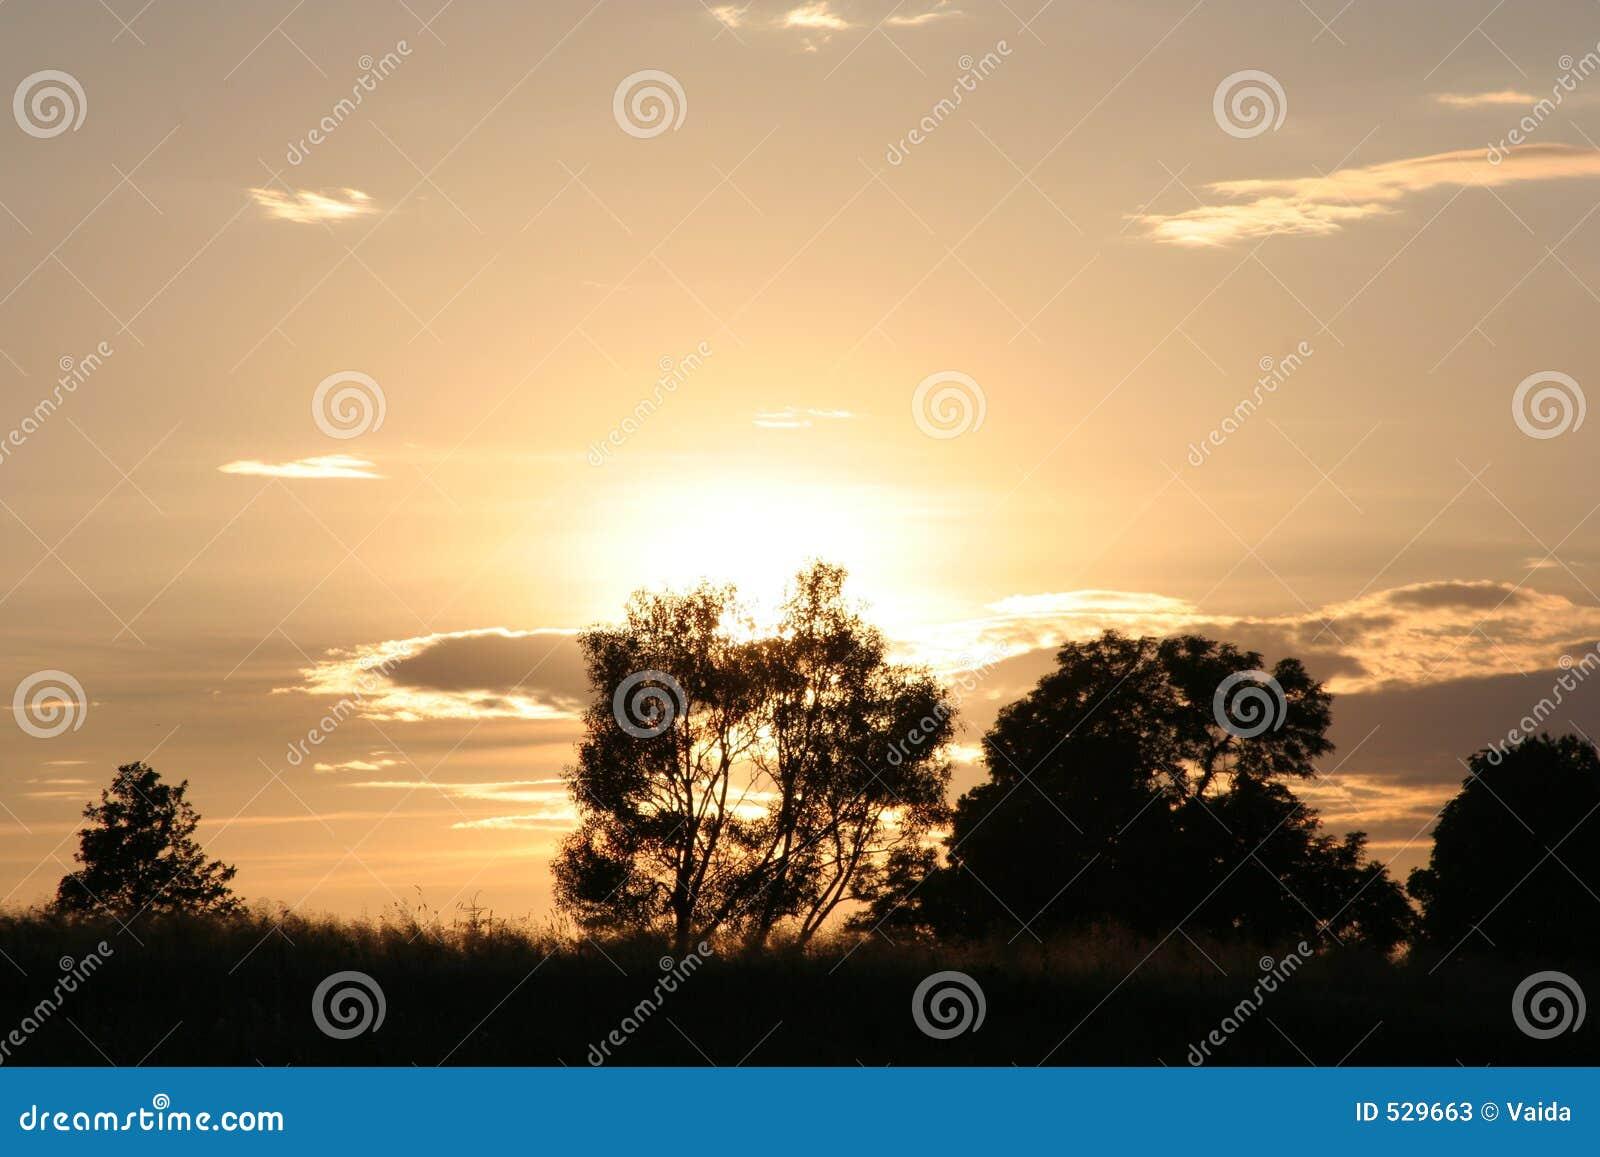 Download 夜间天空 库存图片. 图片 包括有 亮光, 日落, 夜间, 背包, 晒裂, 本质, 云彩, 发光, 结构树, 天空 - 529663